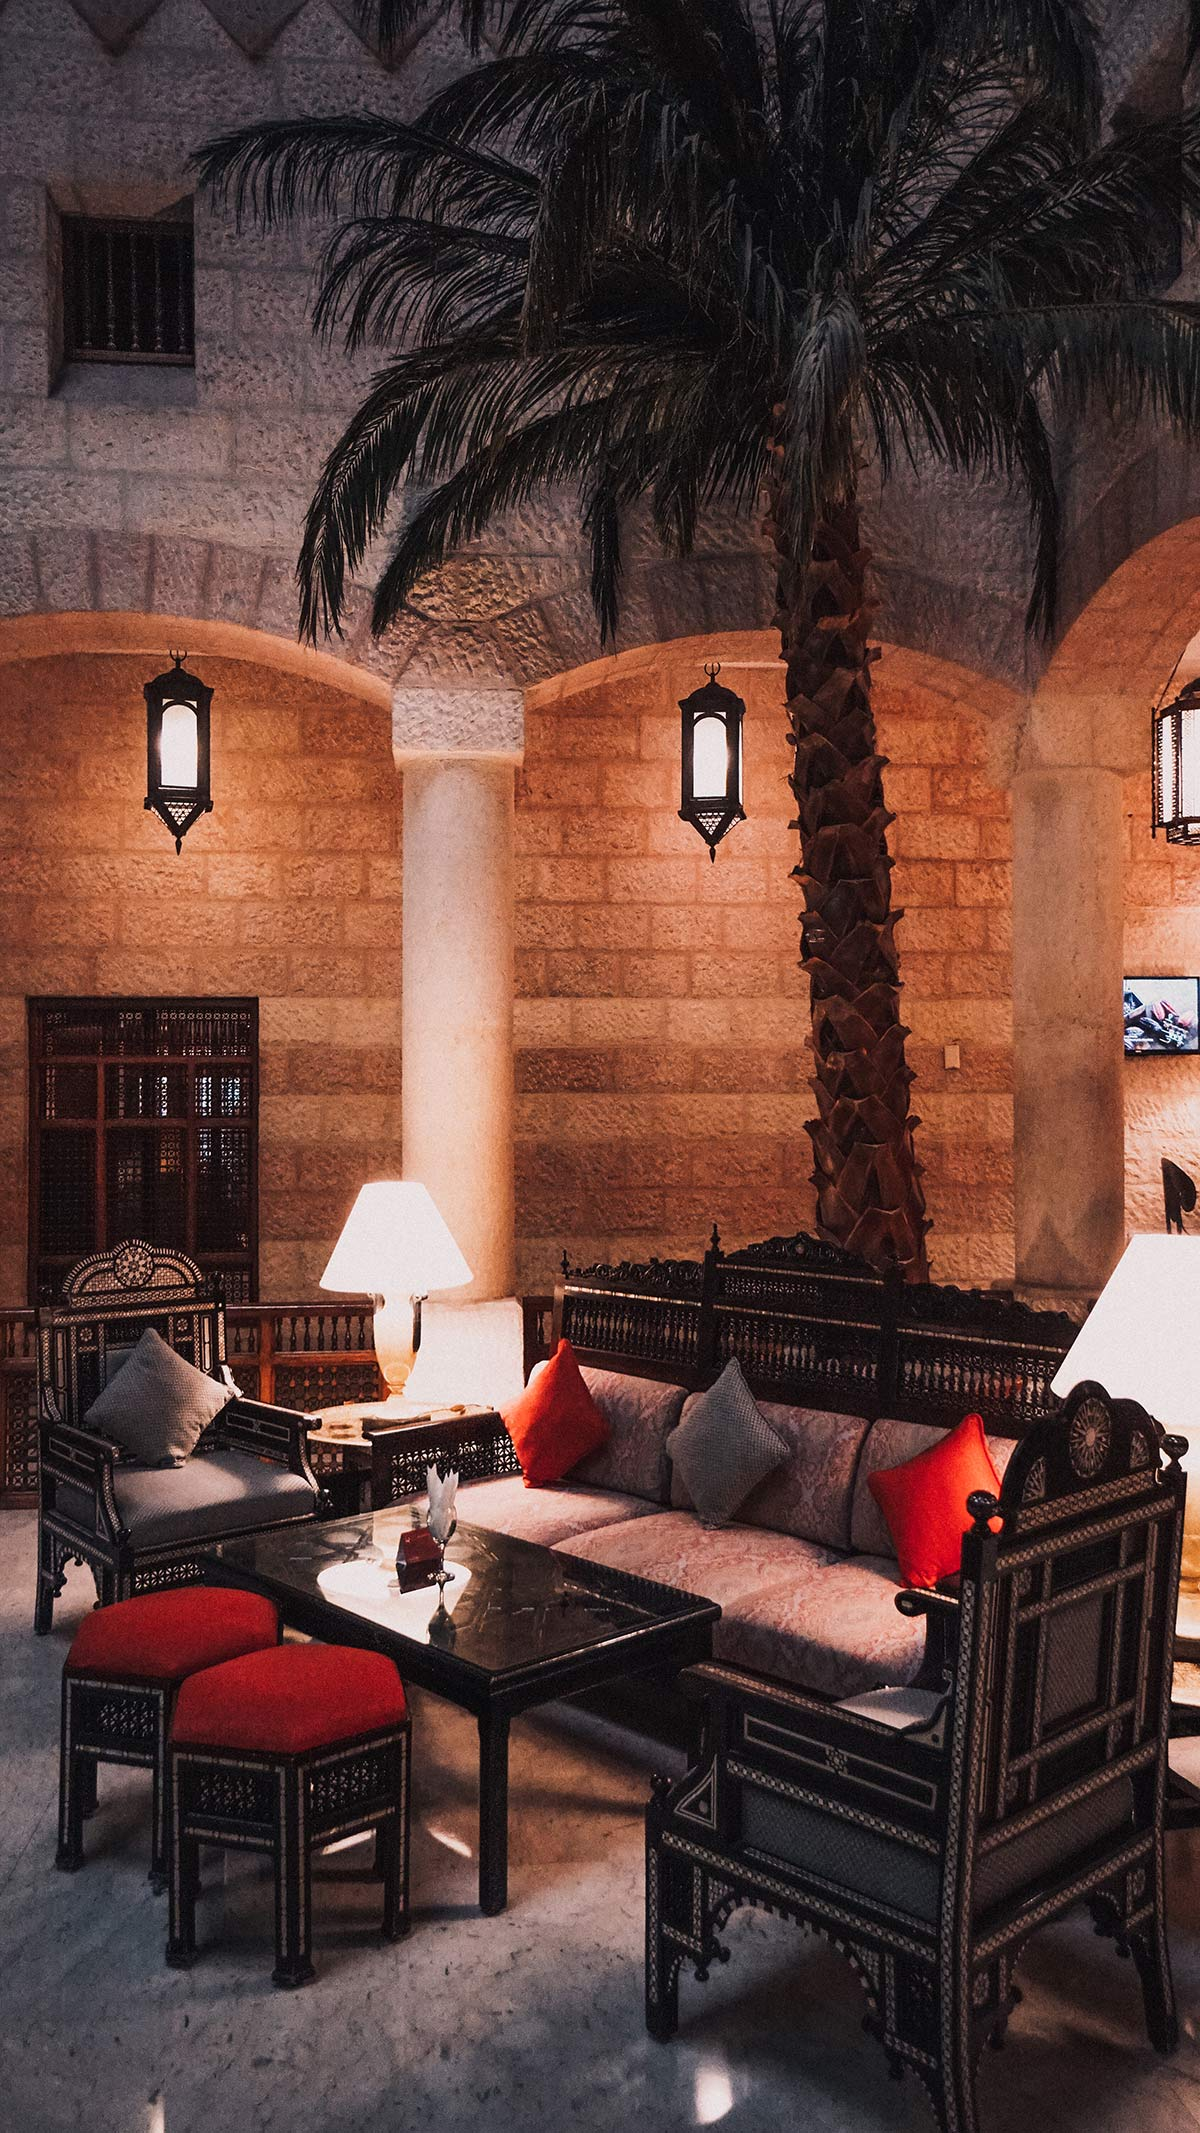 Moevenpick Lobby Hotel Petra